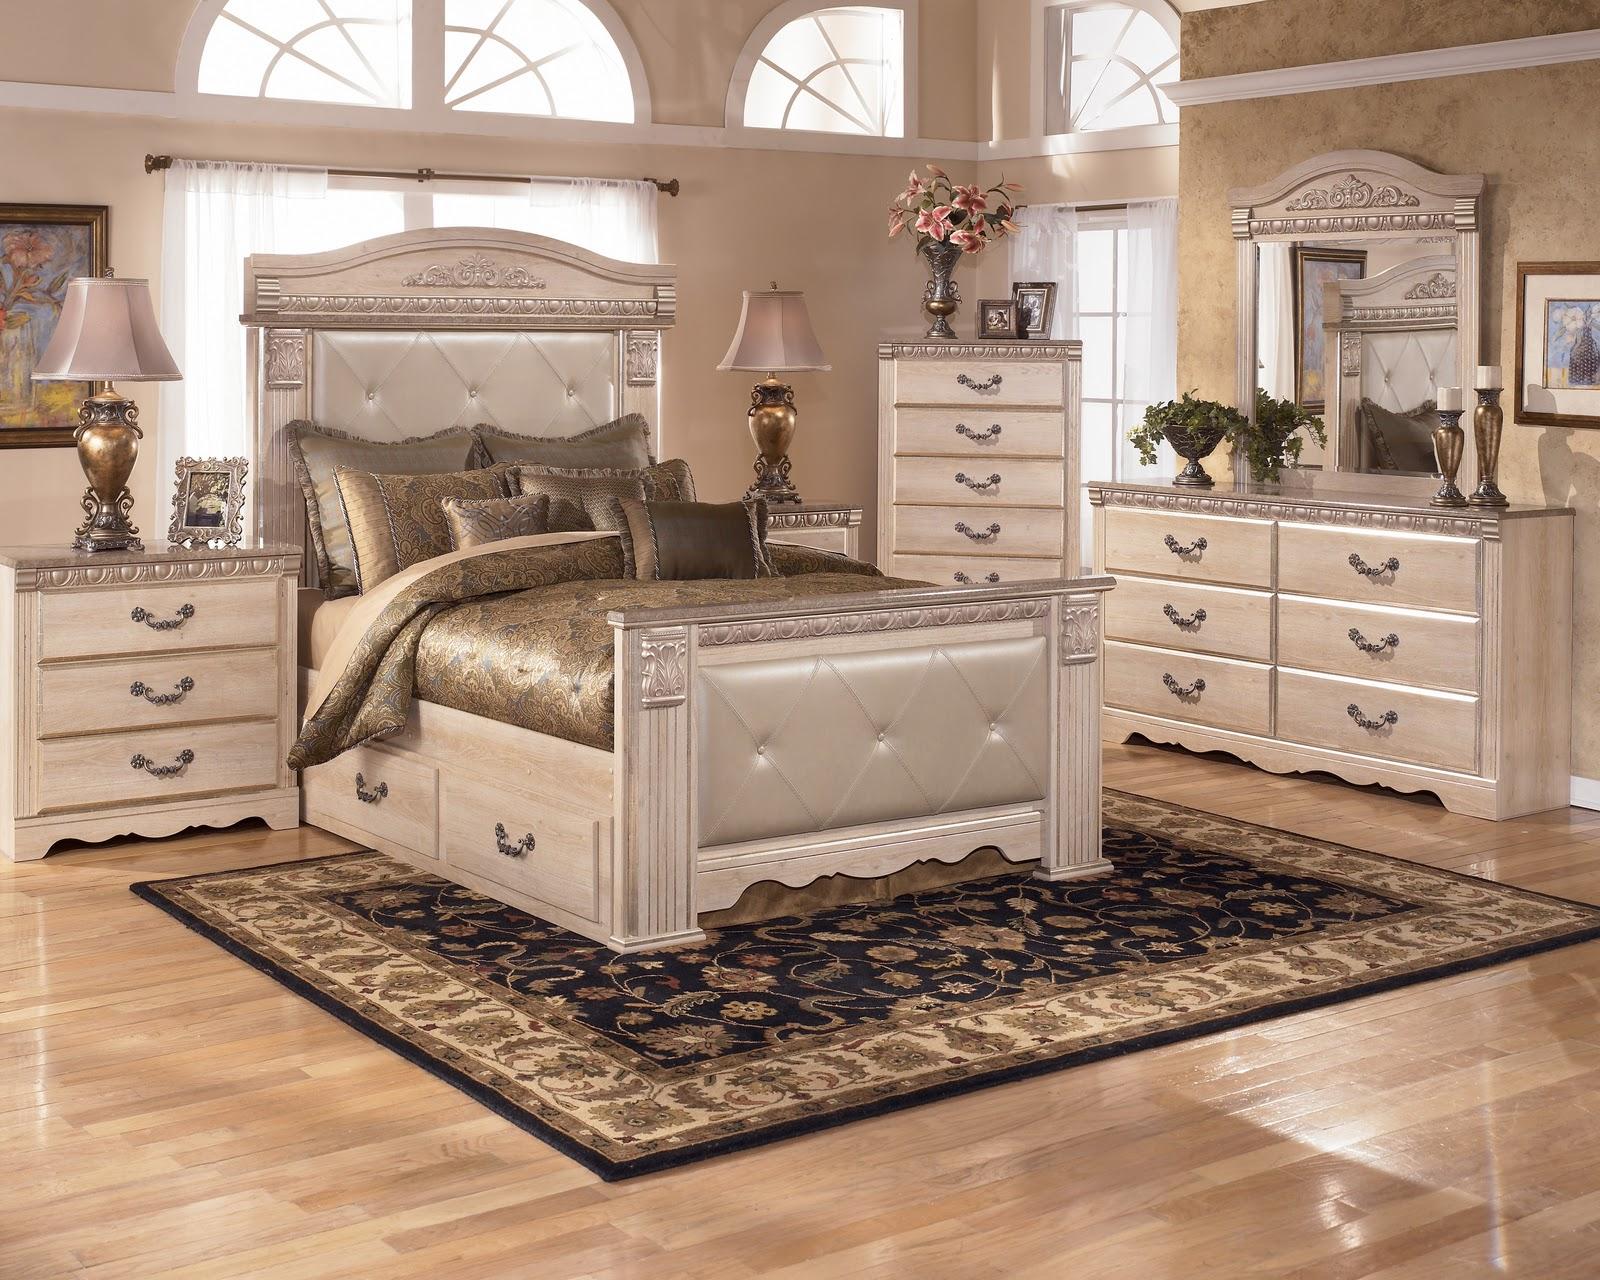 Ashley Bedroom Furniture Edmonton Images Brilliant Ddnspexcelinfo - Ashley bedroom furniture collections